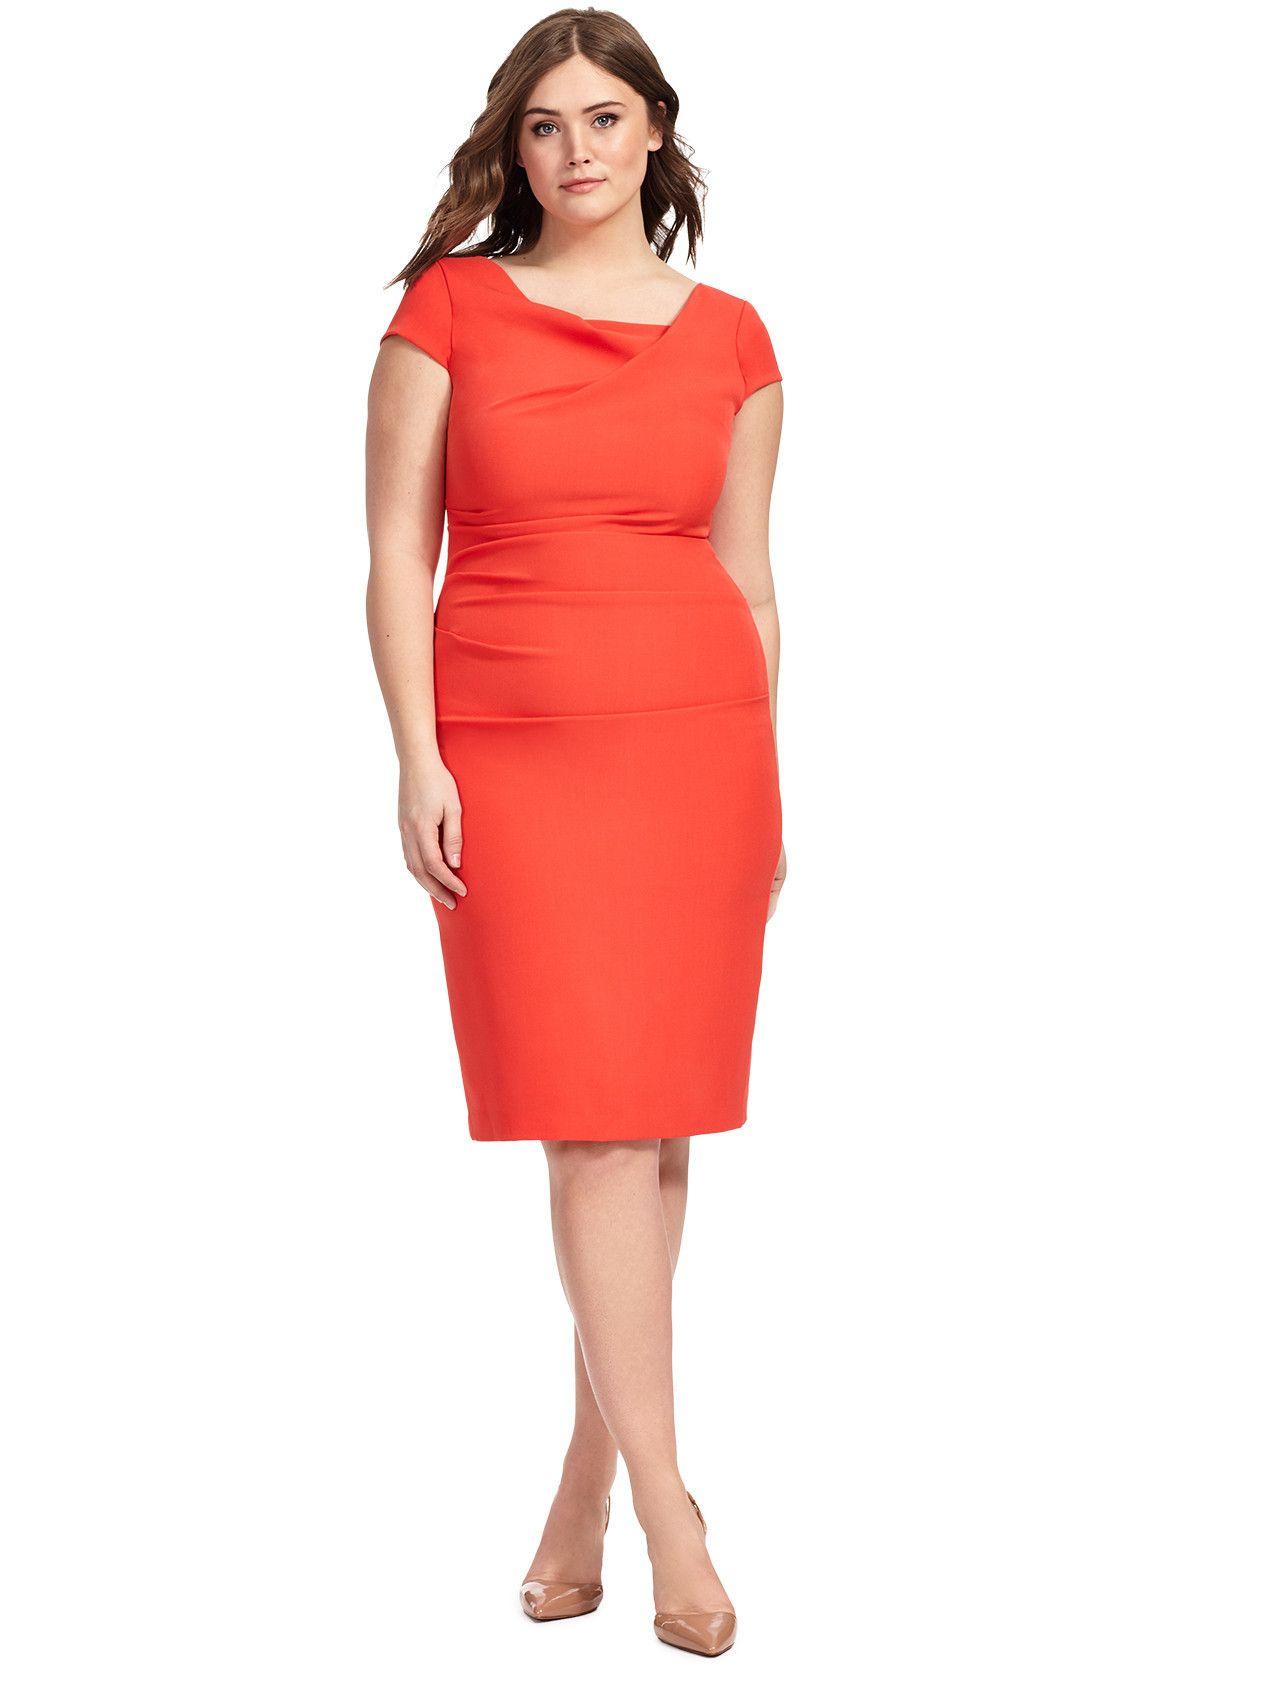 Bright Cayenne Cowl Neck Dress